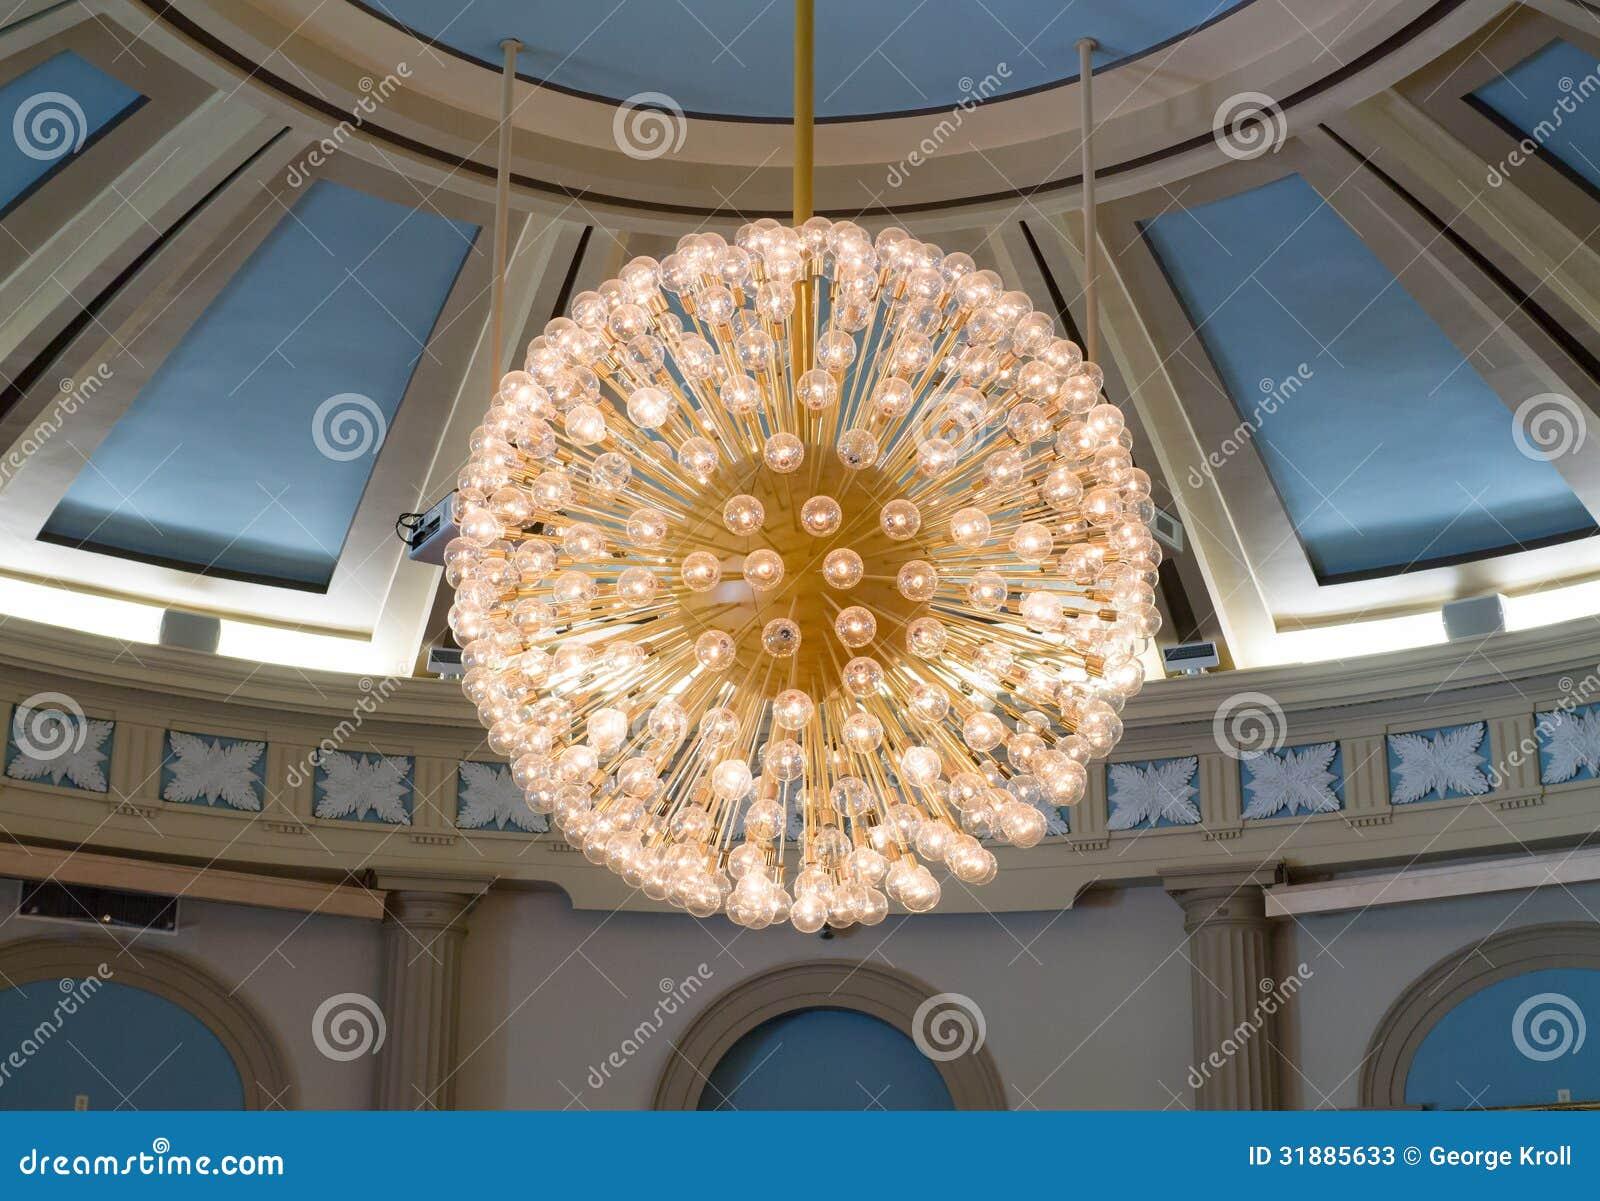 Large light fixtures Breakfast Table Light Large Globe Light Fixture Amazoncom Large Globe Light Fixture Stock Image Image Of Spherical